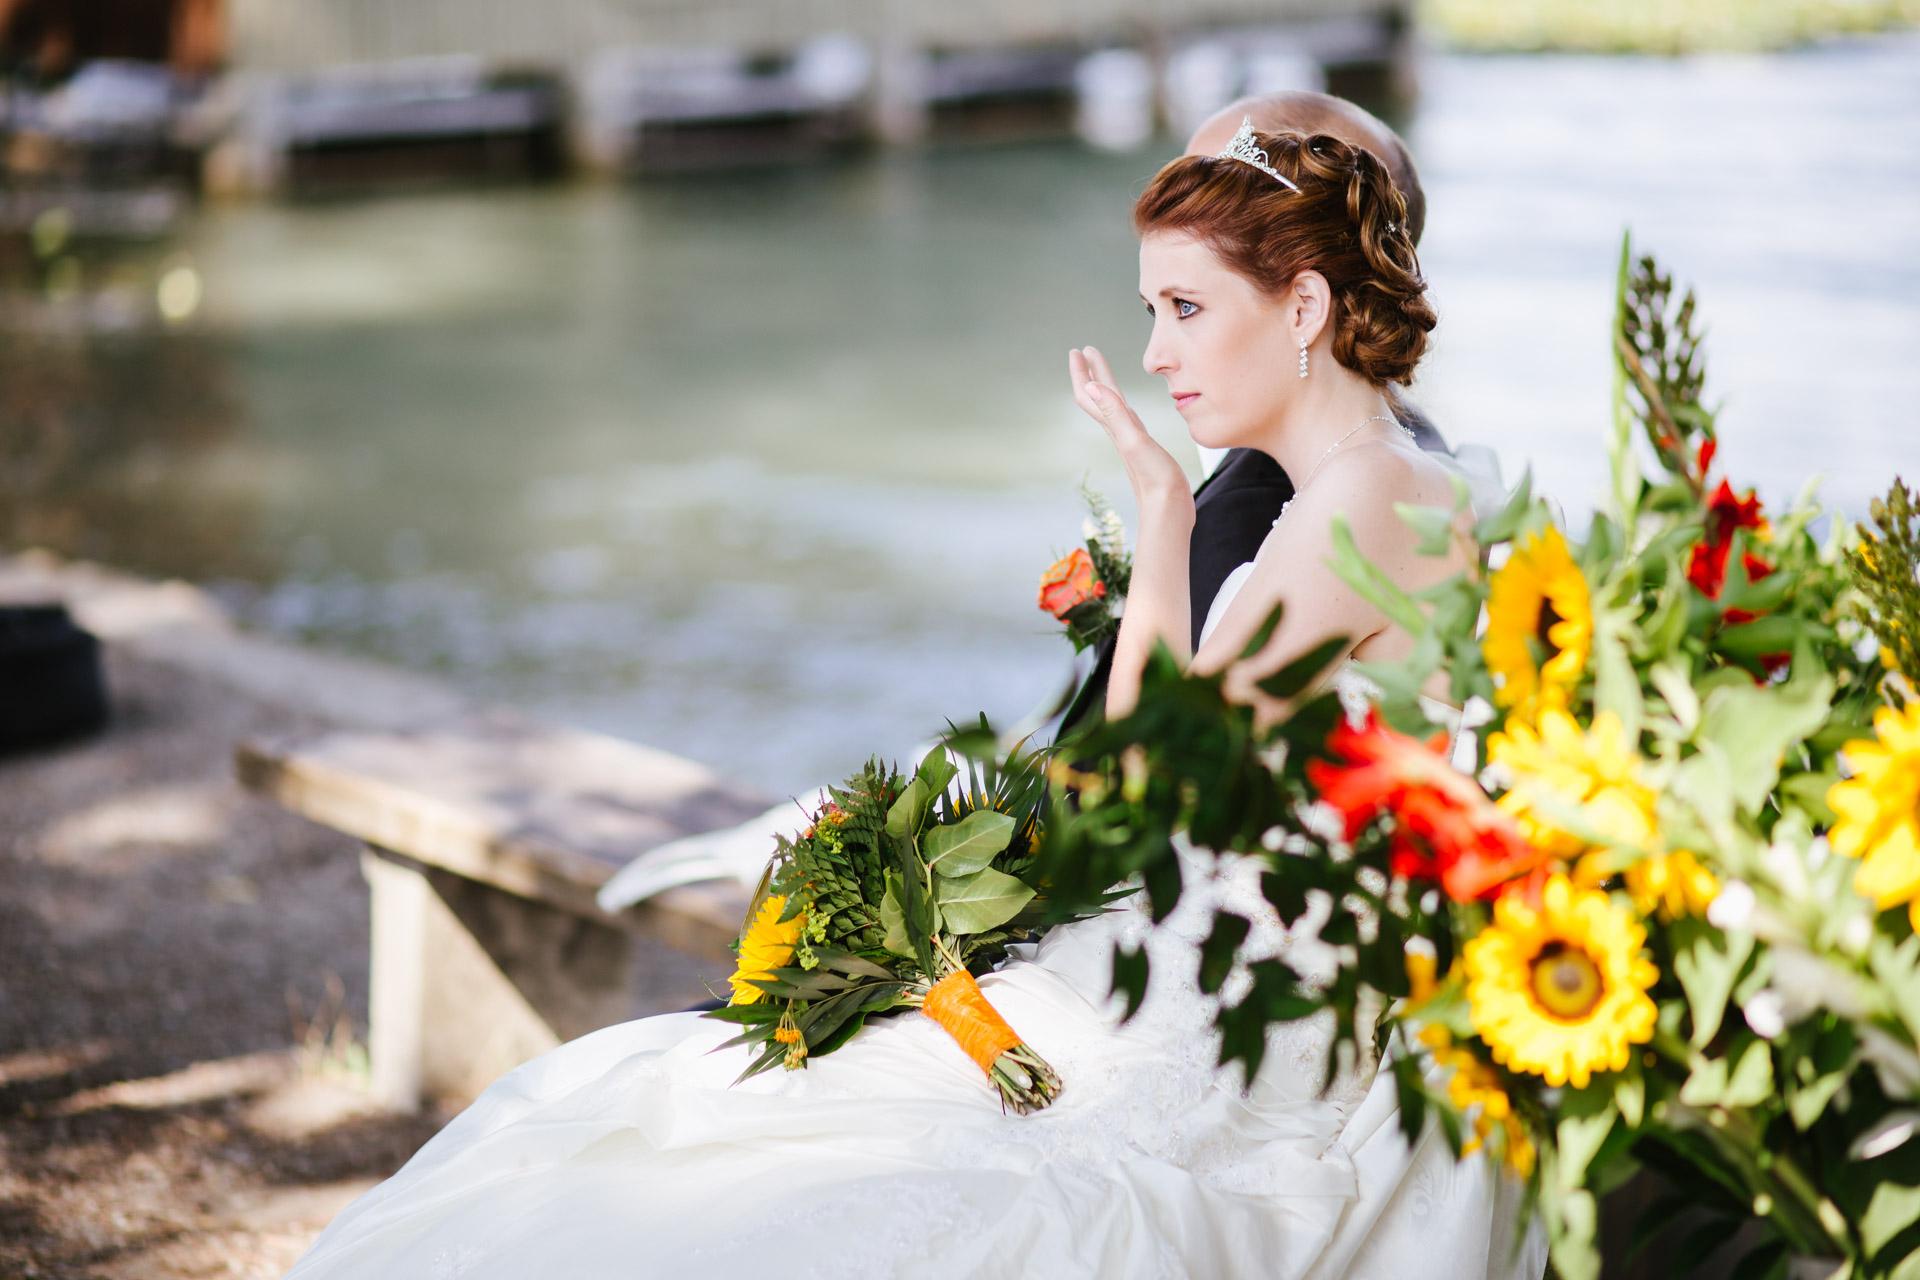 Pixelart_Hochzeitsfotografen_Loerrach_Rheinfelden_Hallwil_Schweiz_Linda-Ramon-1030